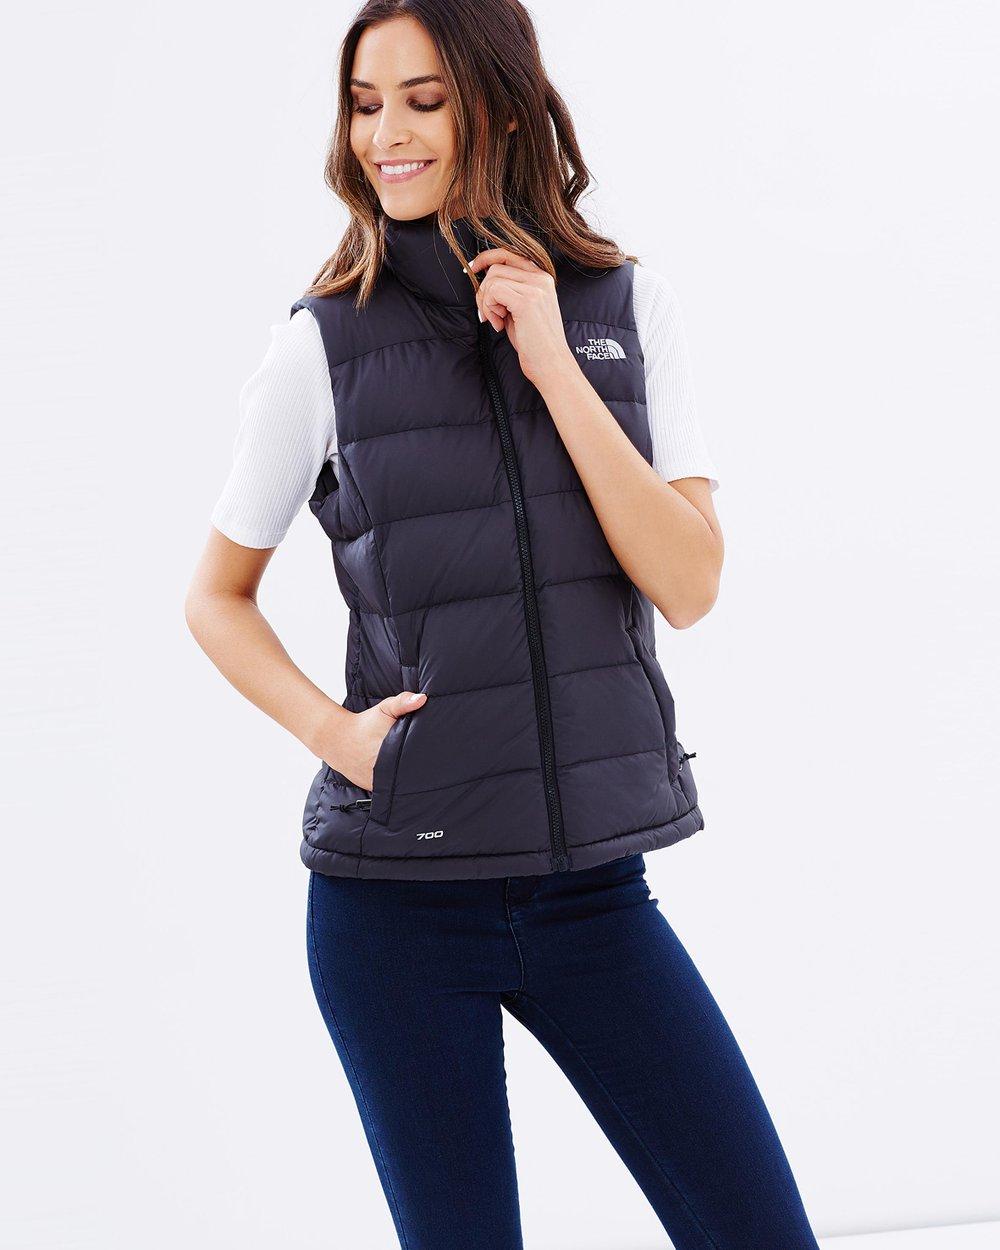 e0863c25cc Womens Nuptse 2 Vest by The North Face Online